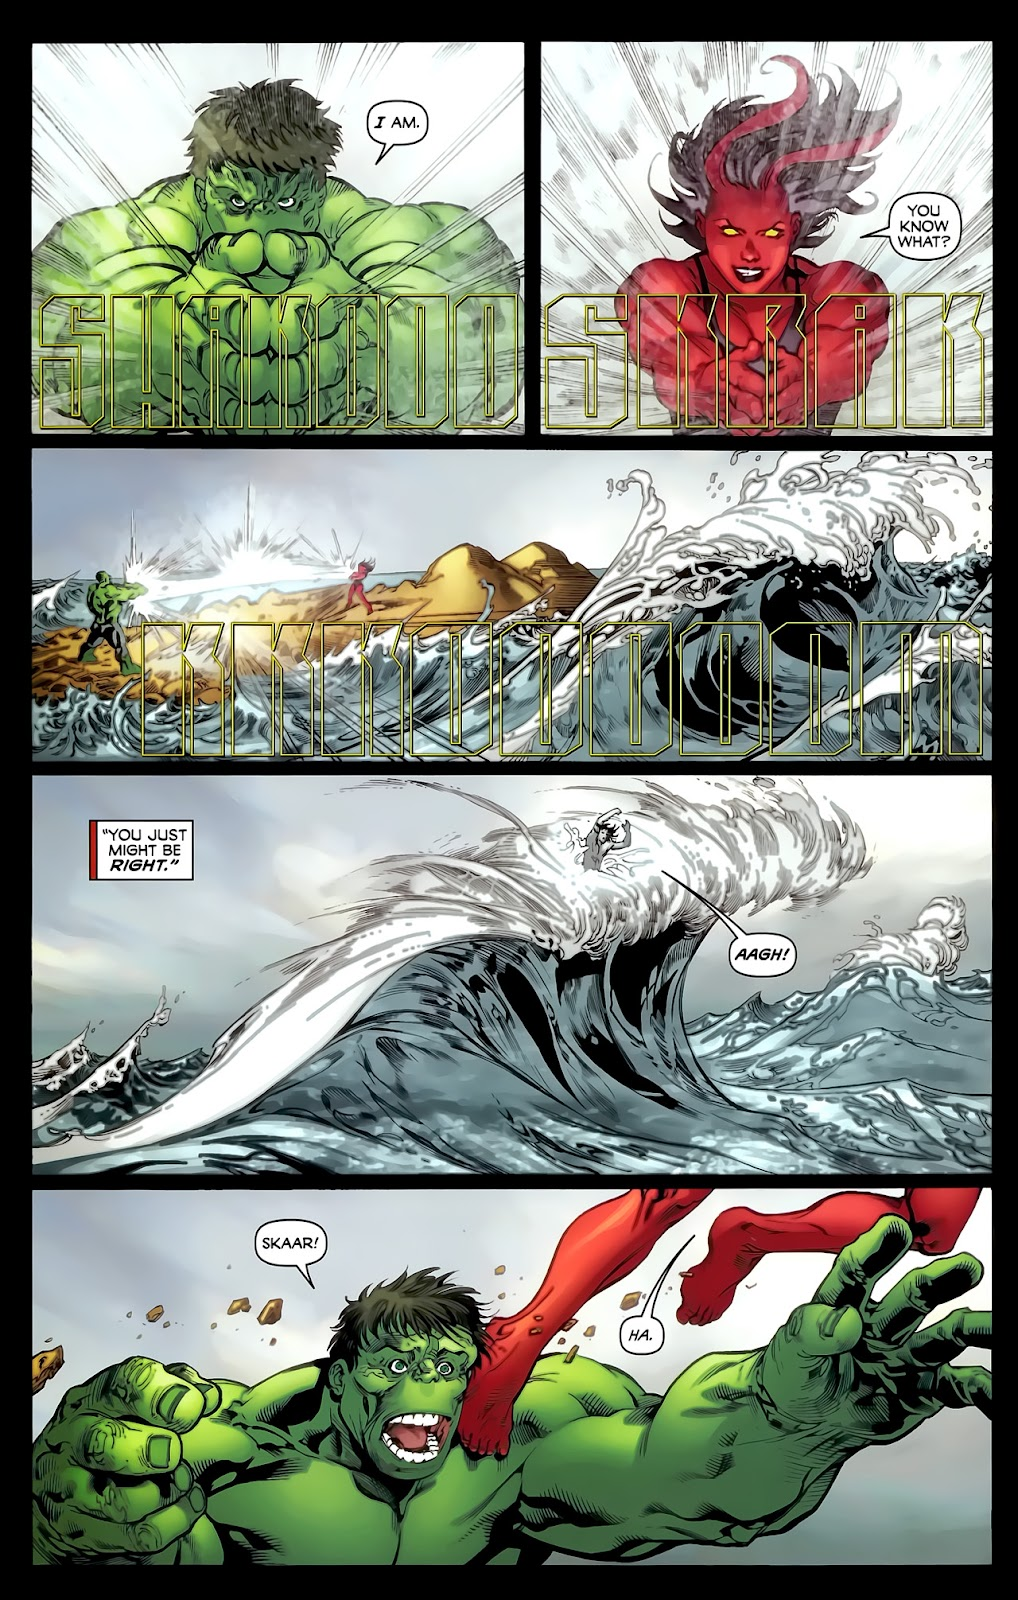 Incredible Hulks (2010) Issue #613 #3 - English 25